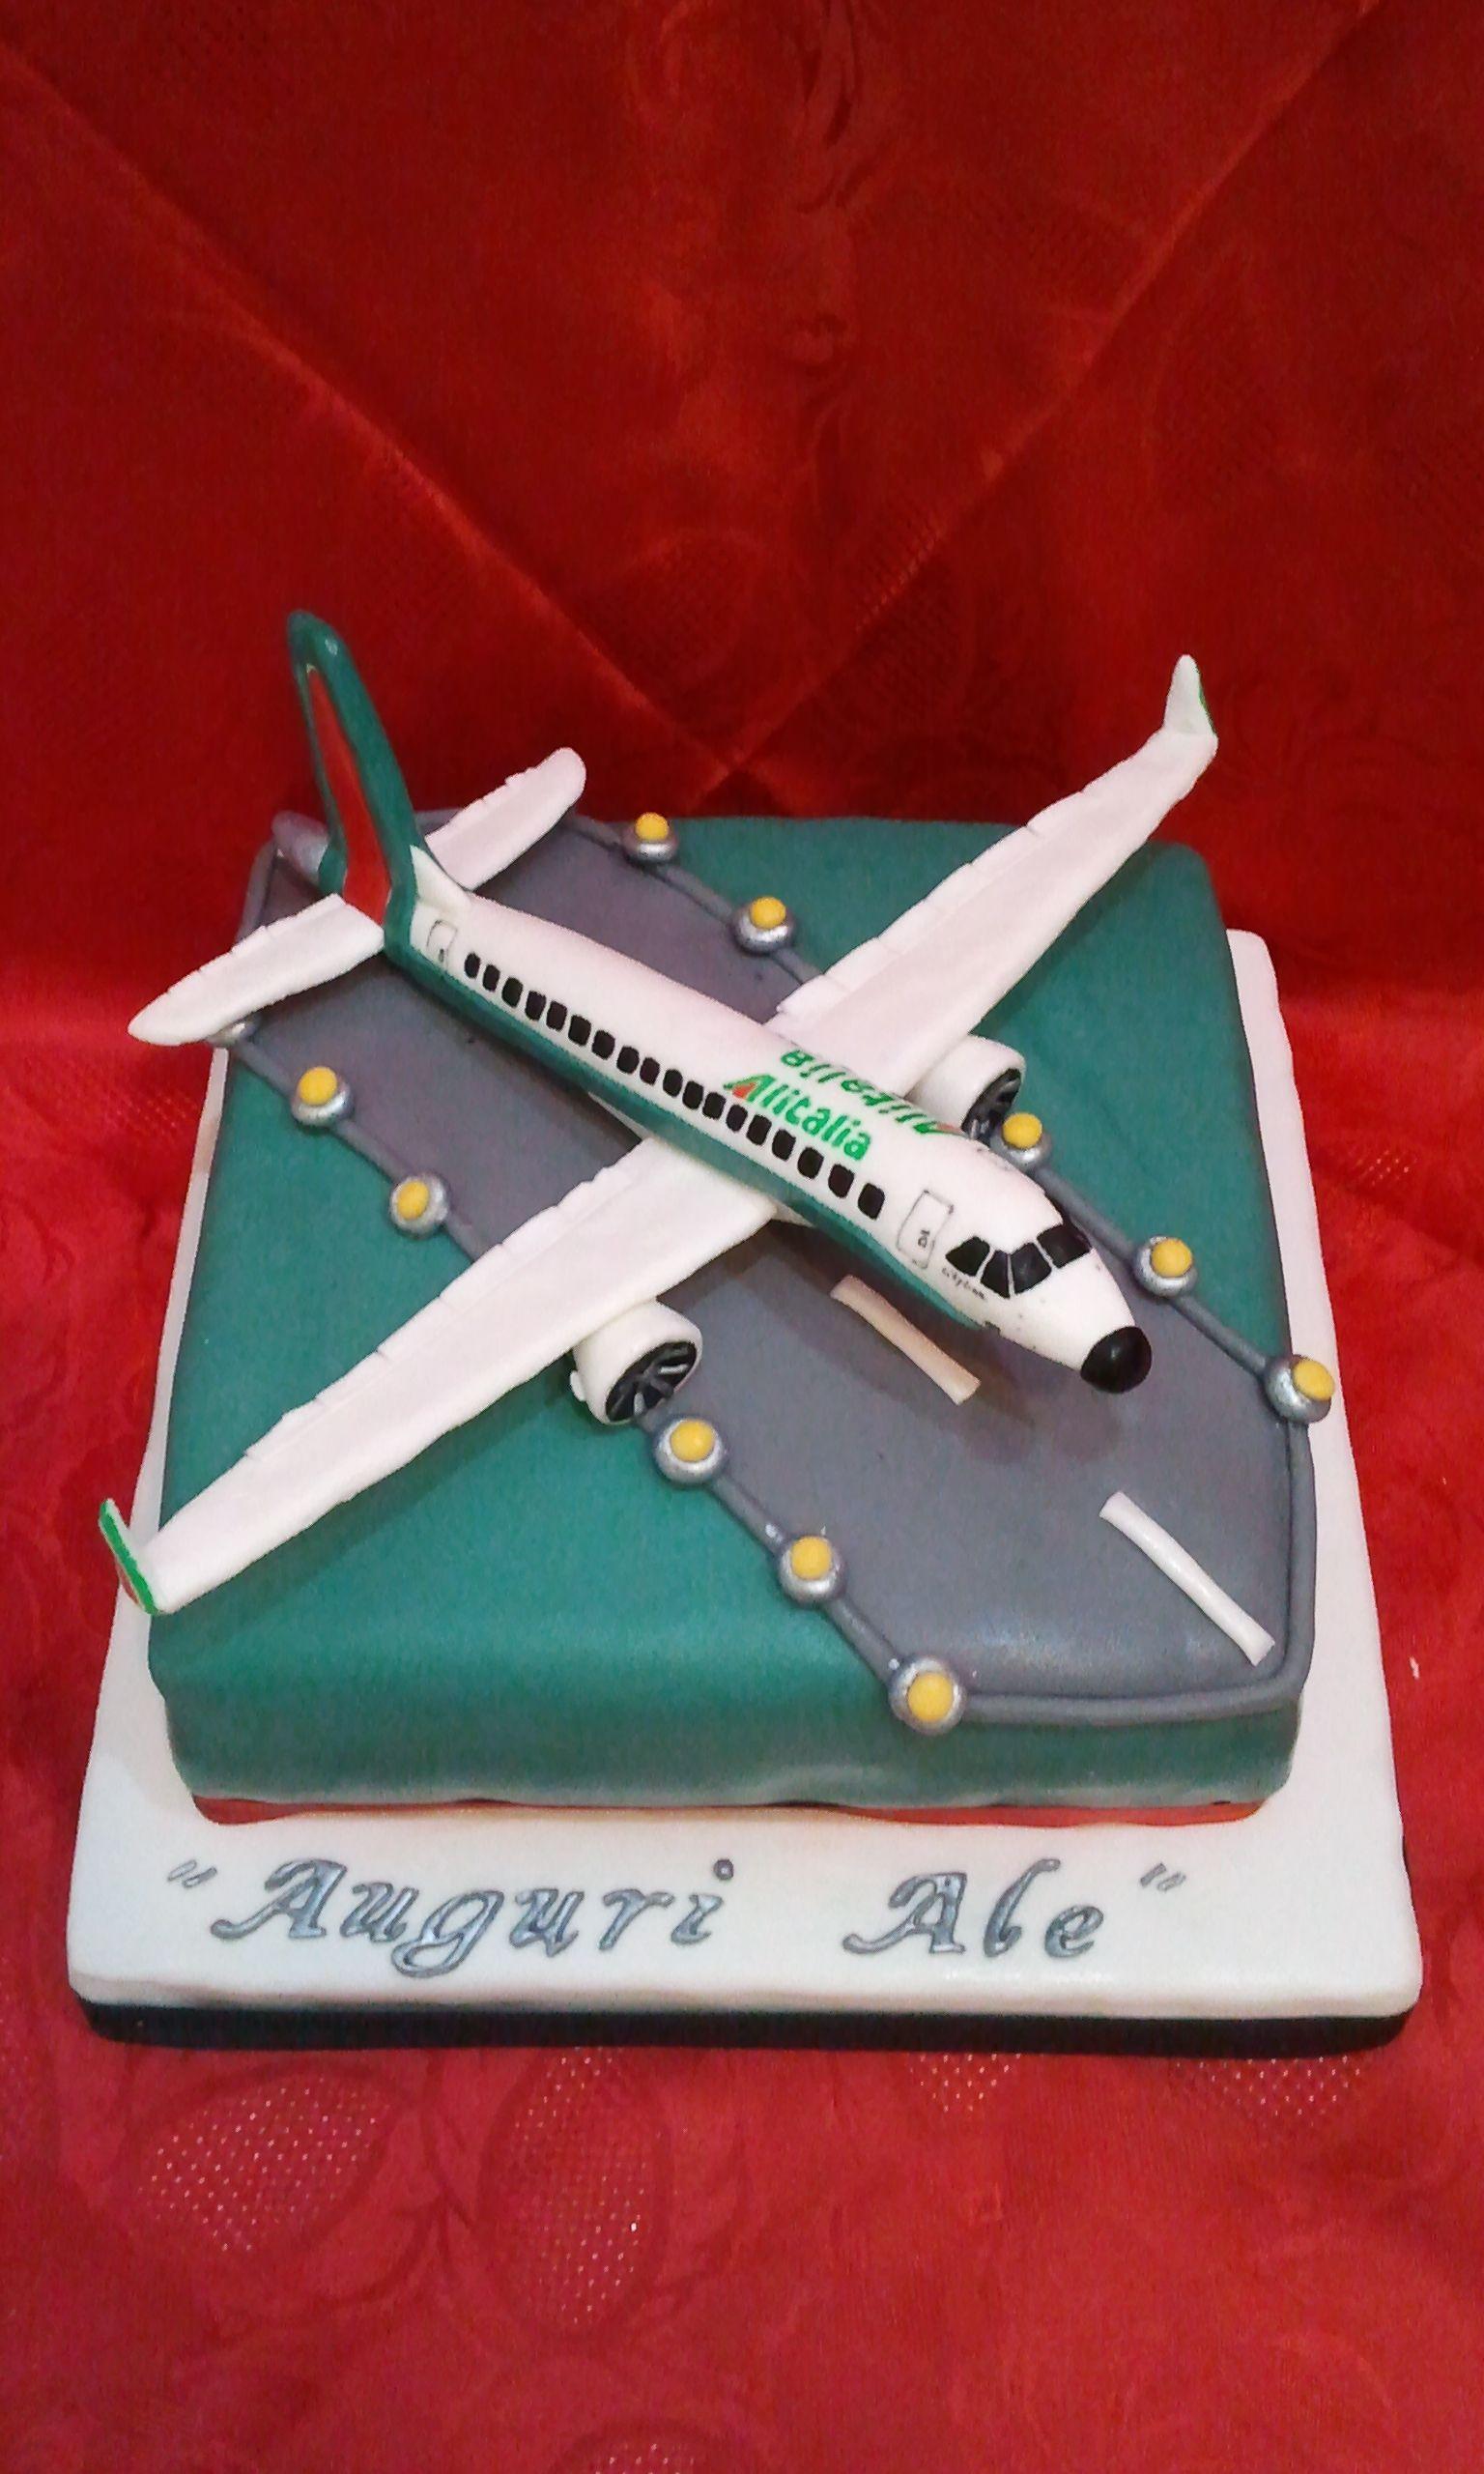 Cake torta aereo dellalitalia jo cakes novara torte con aerei